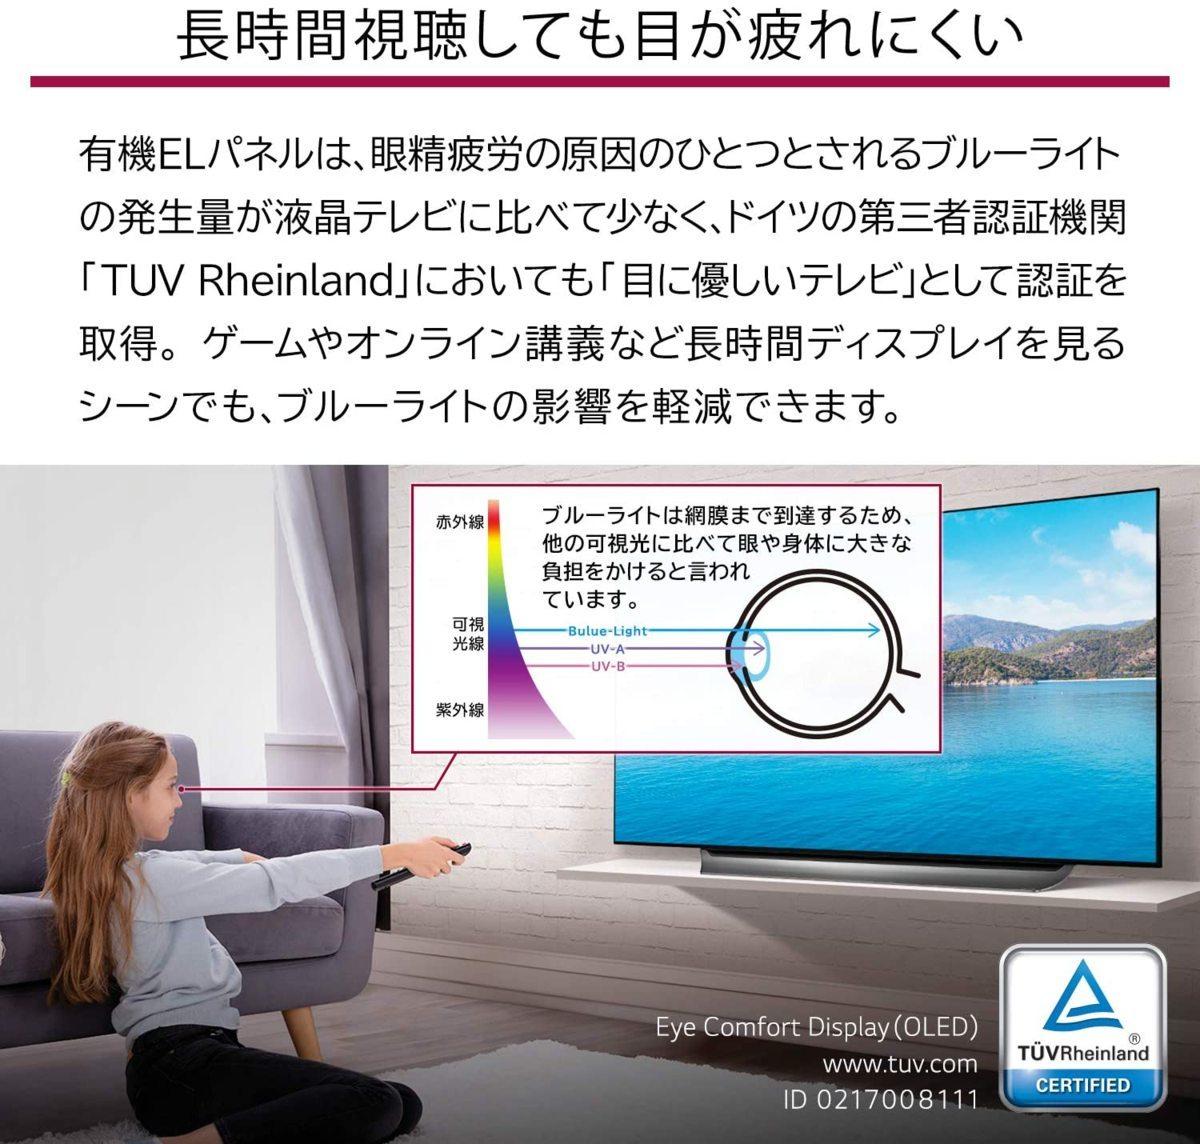 LG 55V型 4Kチューナー内蔵有機ELテレビ OLED55BXPJA 無線LAN/Bluetooth/Dolby Atmos/YouTube/Amazonプライム/Netflix 2021/4から1年保証_画像4